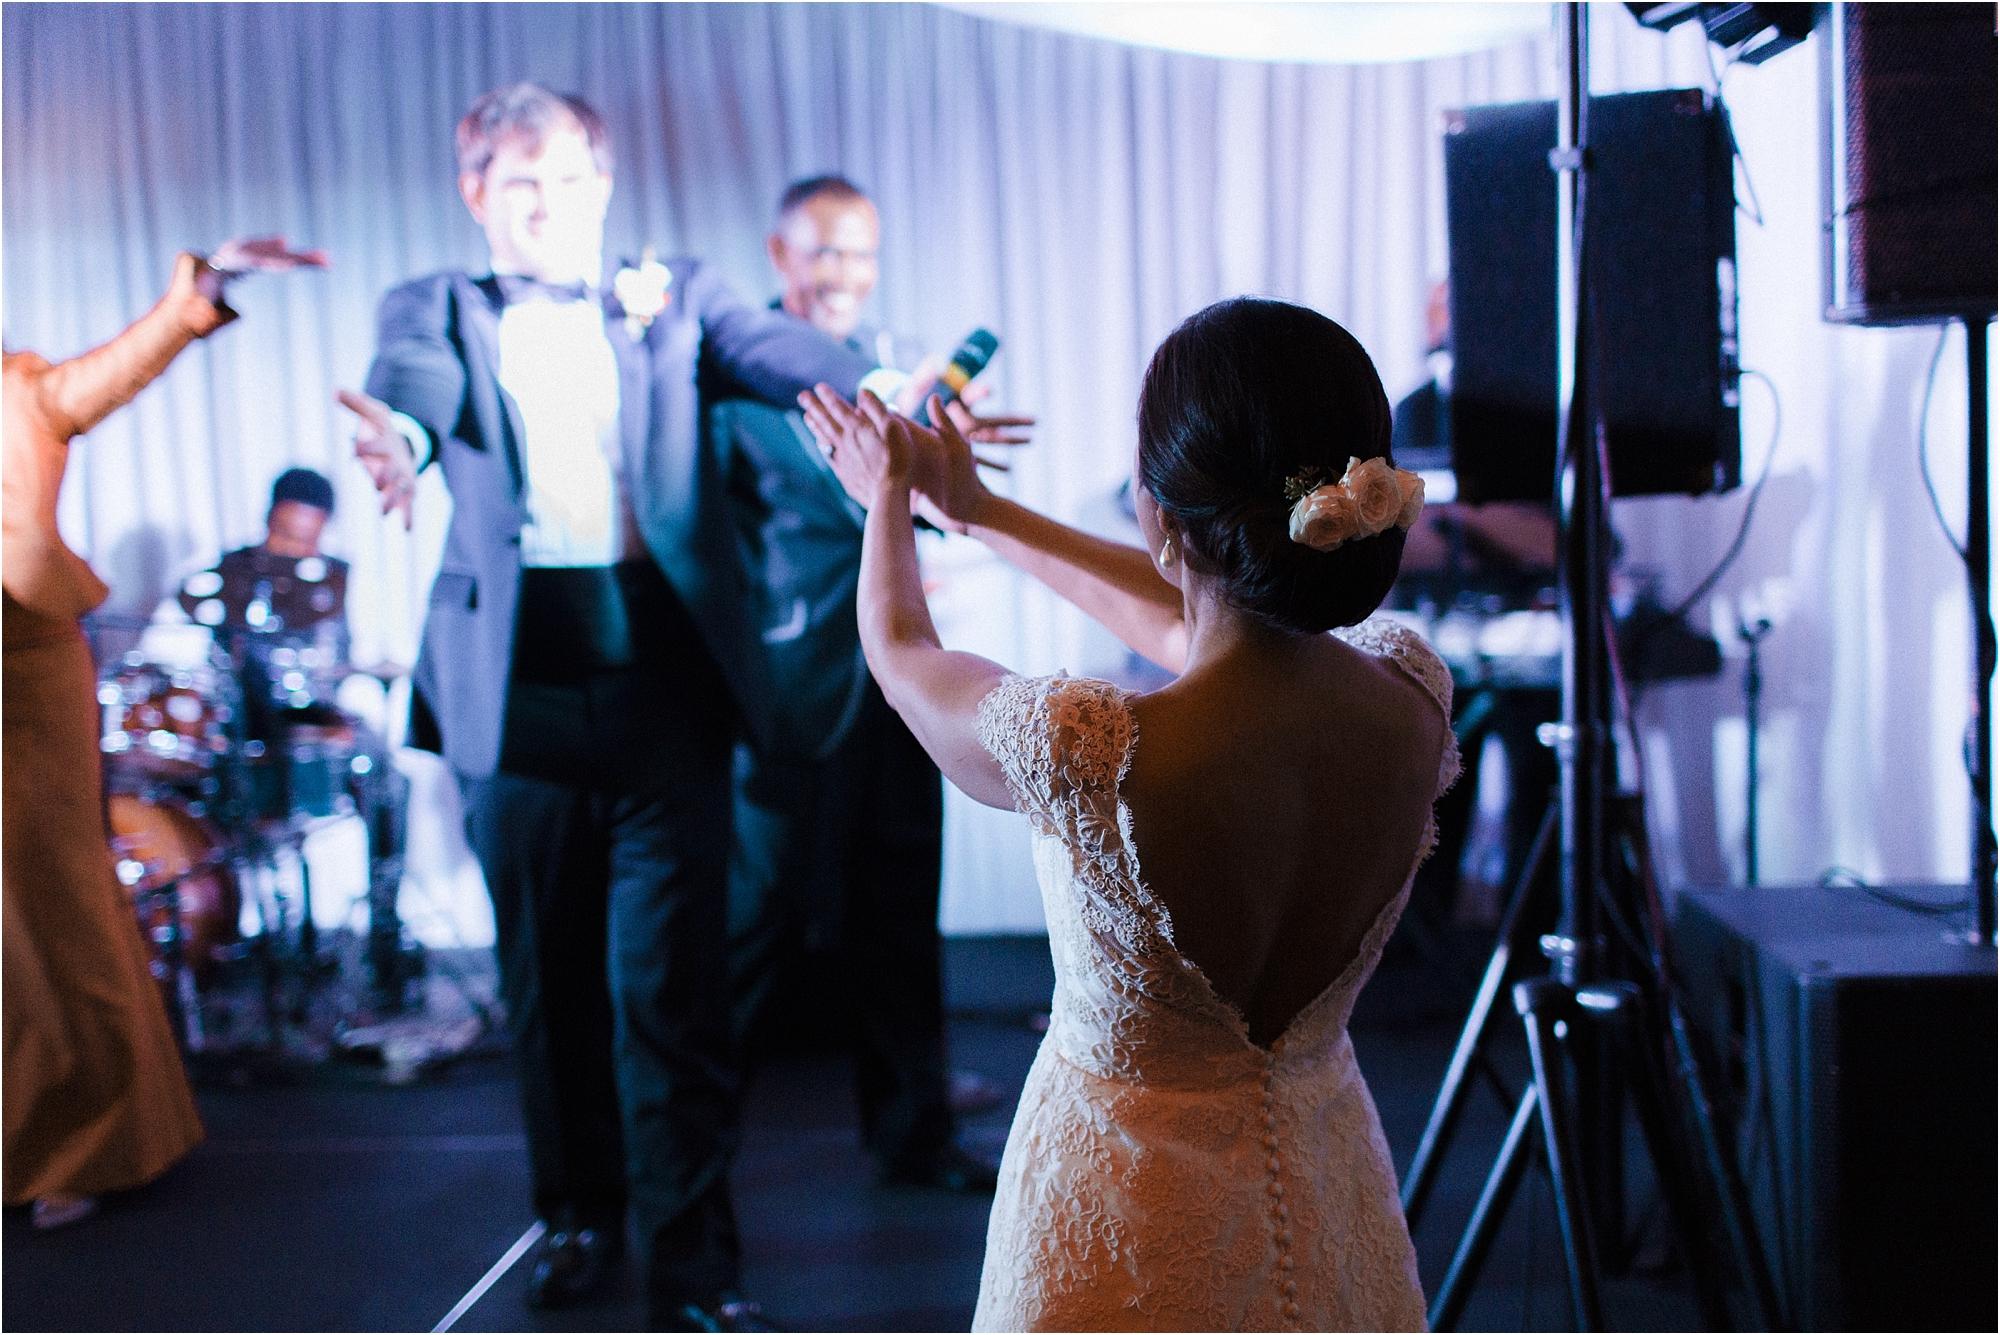 stephanie-yonce-photography-richmond-virginia-country-club-wedding-photo_046.JPG